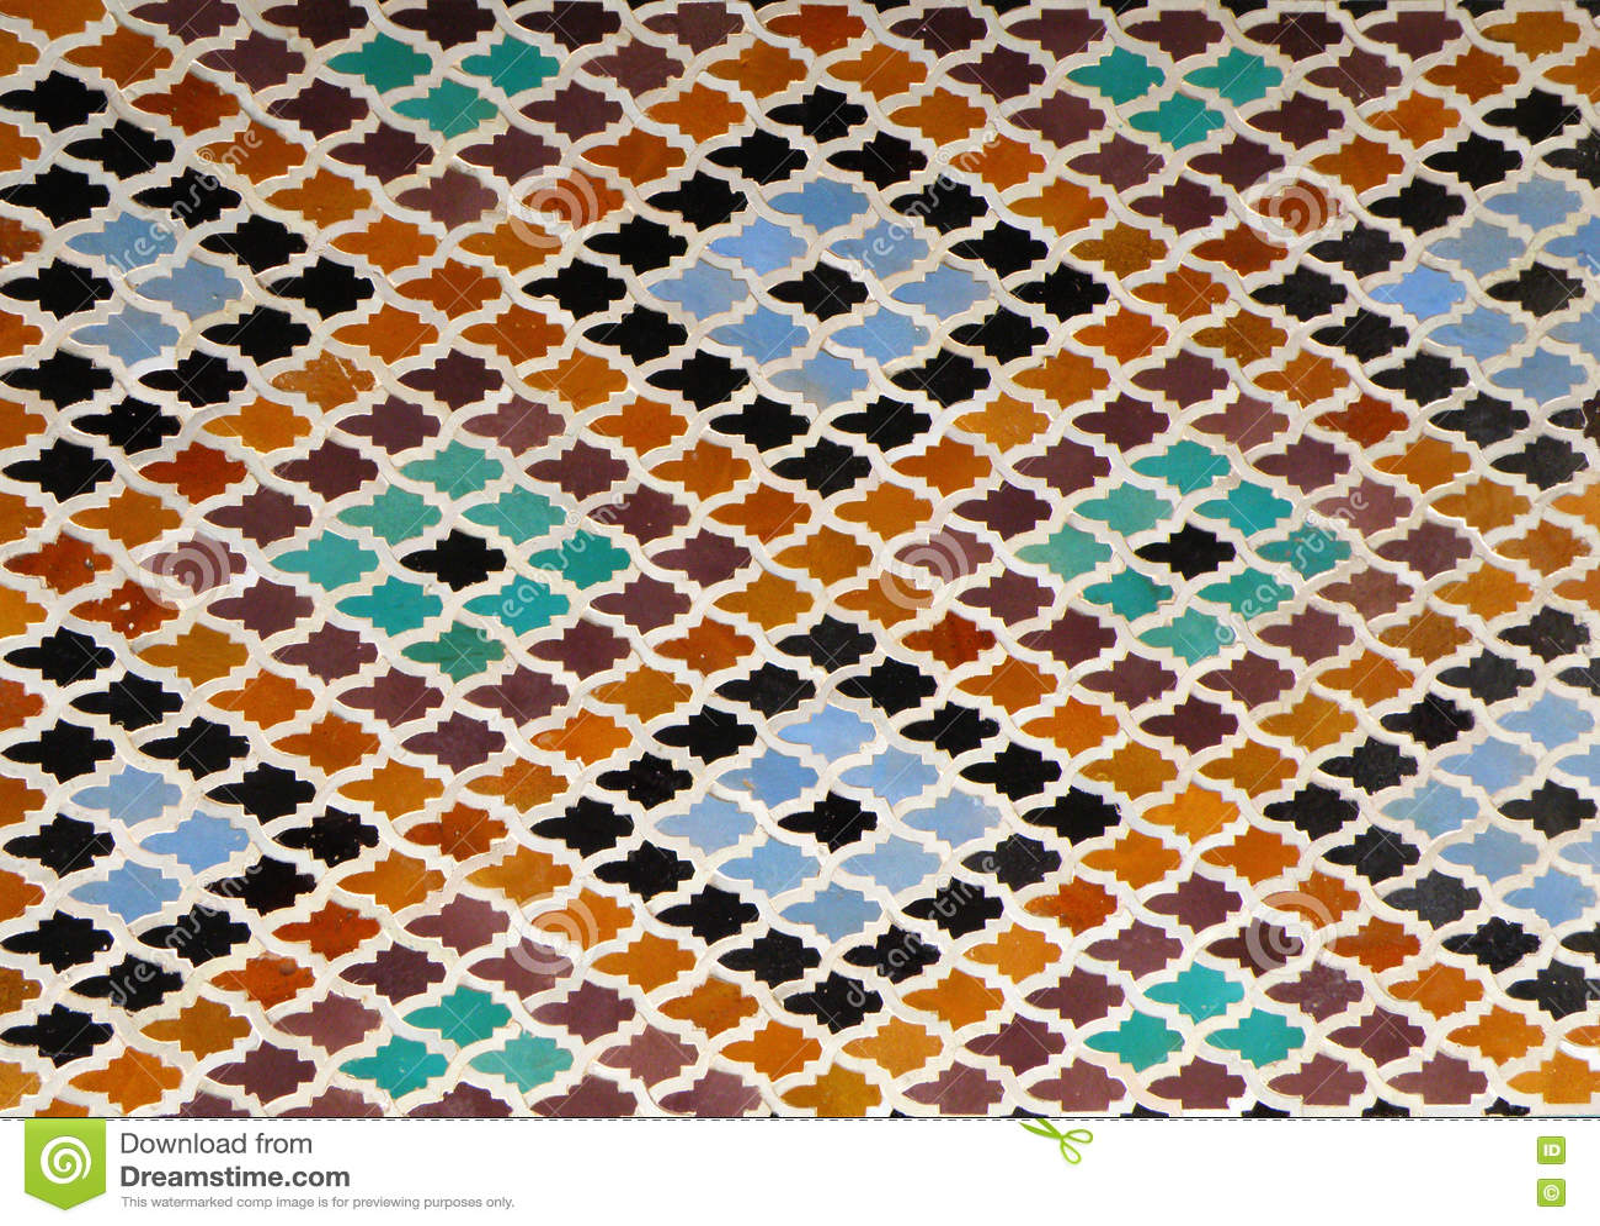 Moroccan Style Diamondshaped Pattern Bright Blue Orange Brown Color